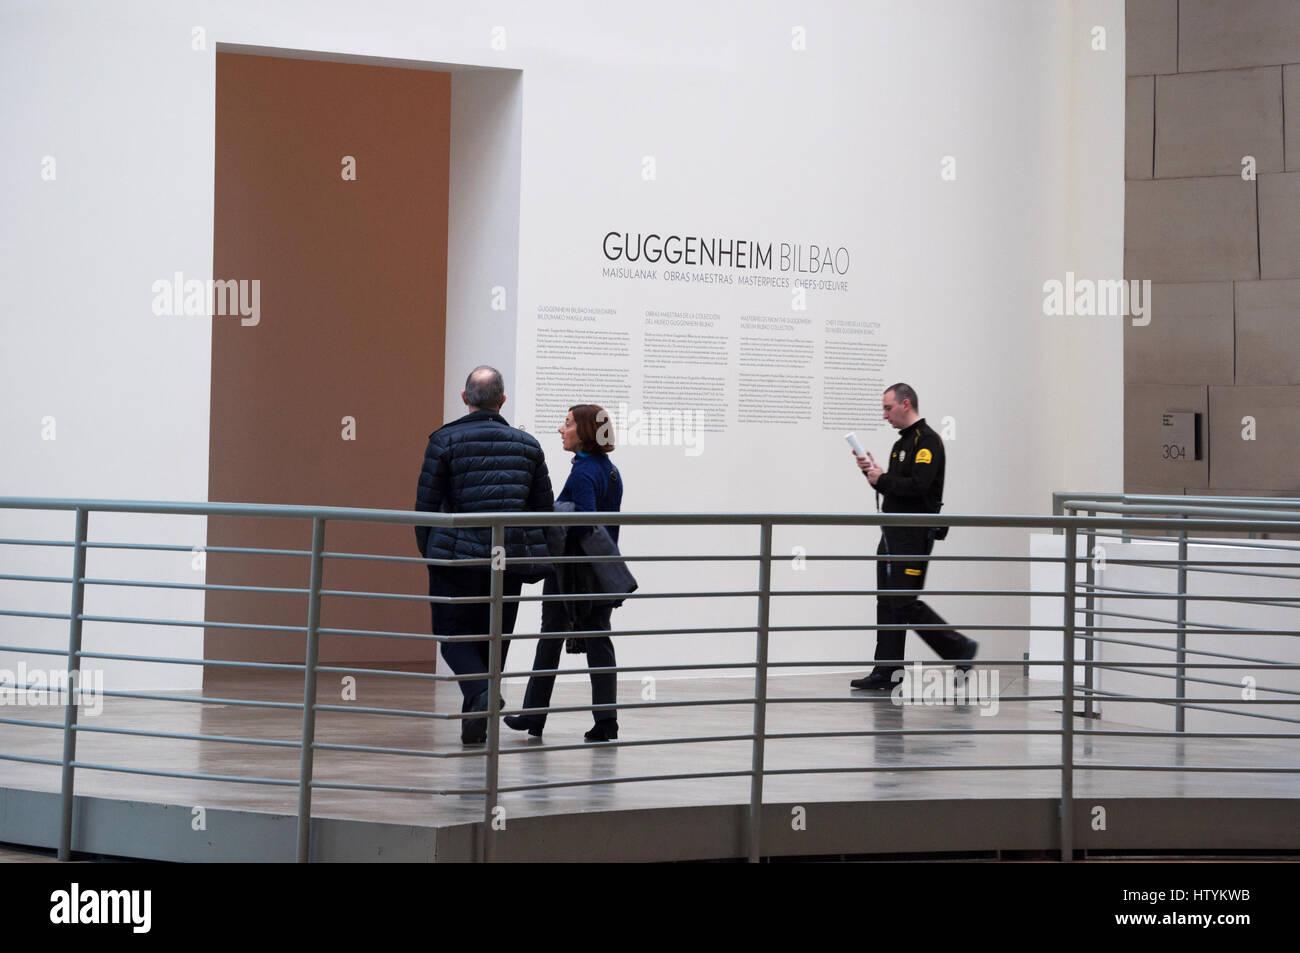 Bilbao, Spanien: das Interieur des Guggenheim Museum Bilbao, das ...